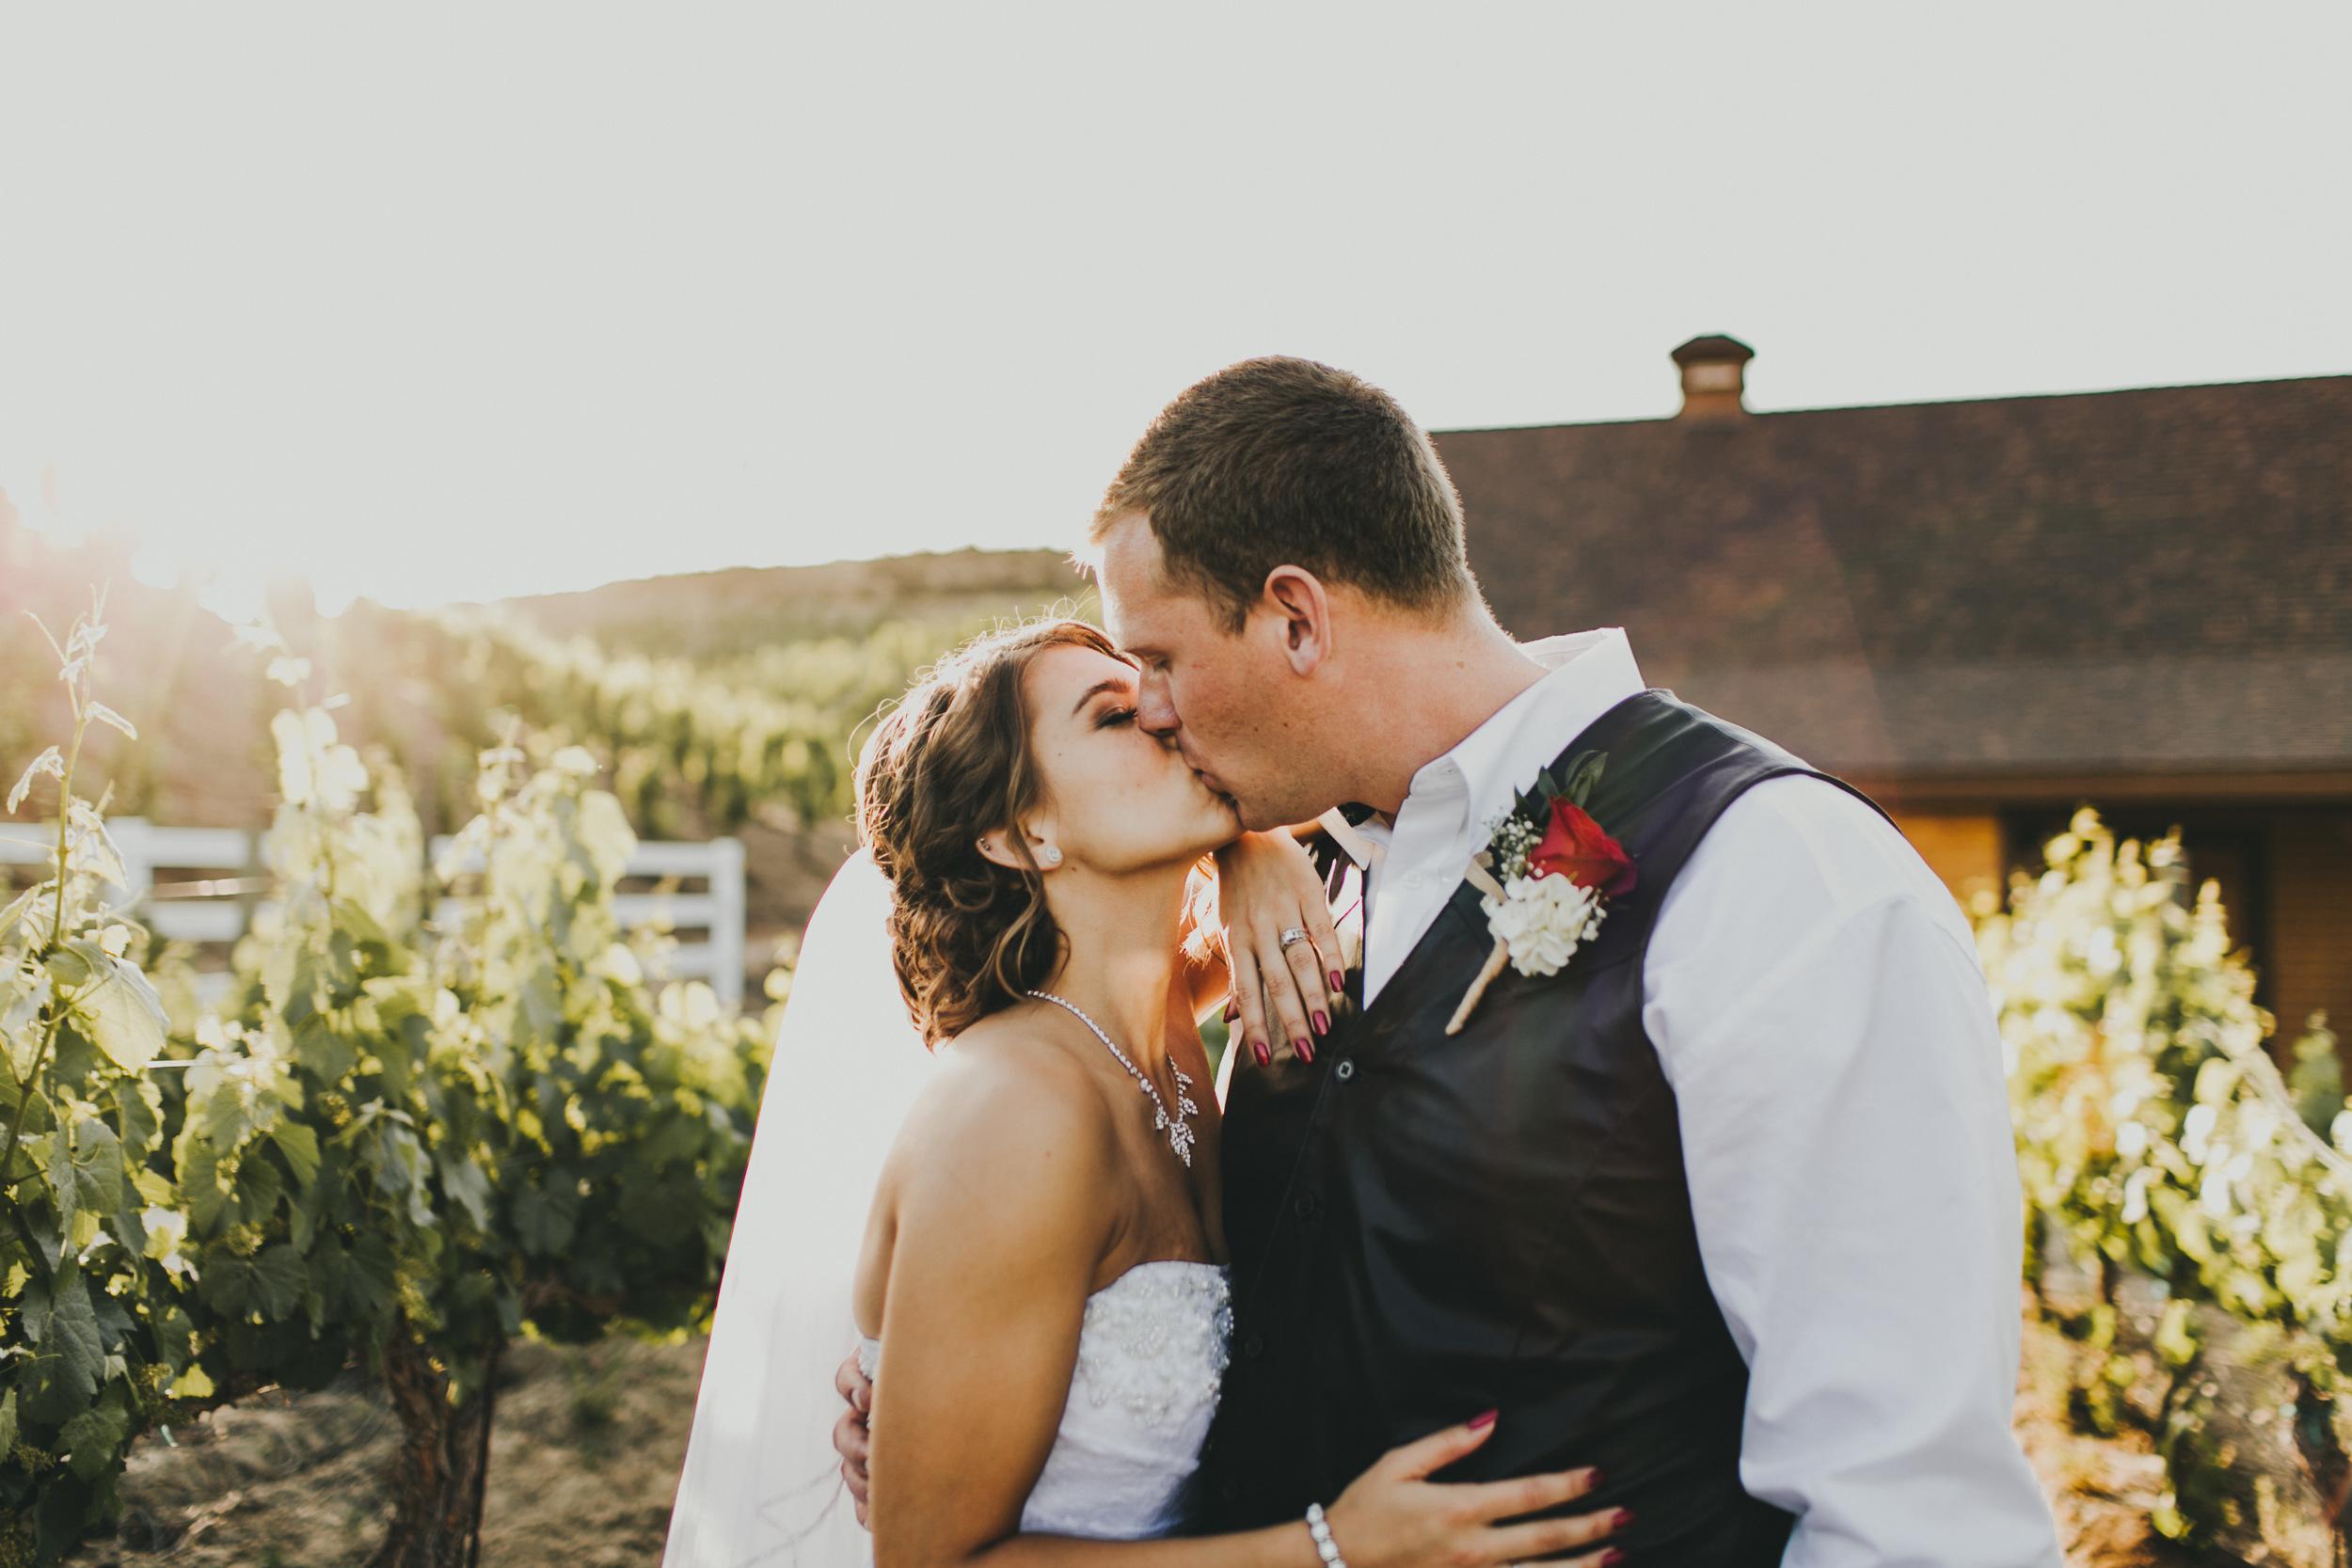 Cheyenne + Jordan - Wedding, Natalie Griffo (81 of 157).jpg